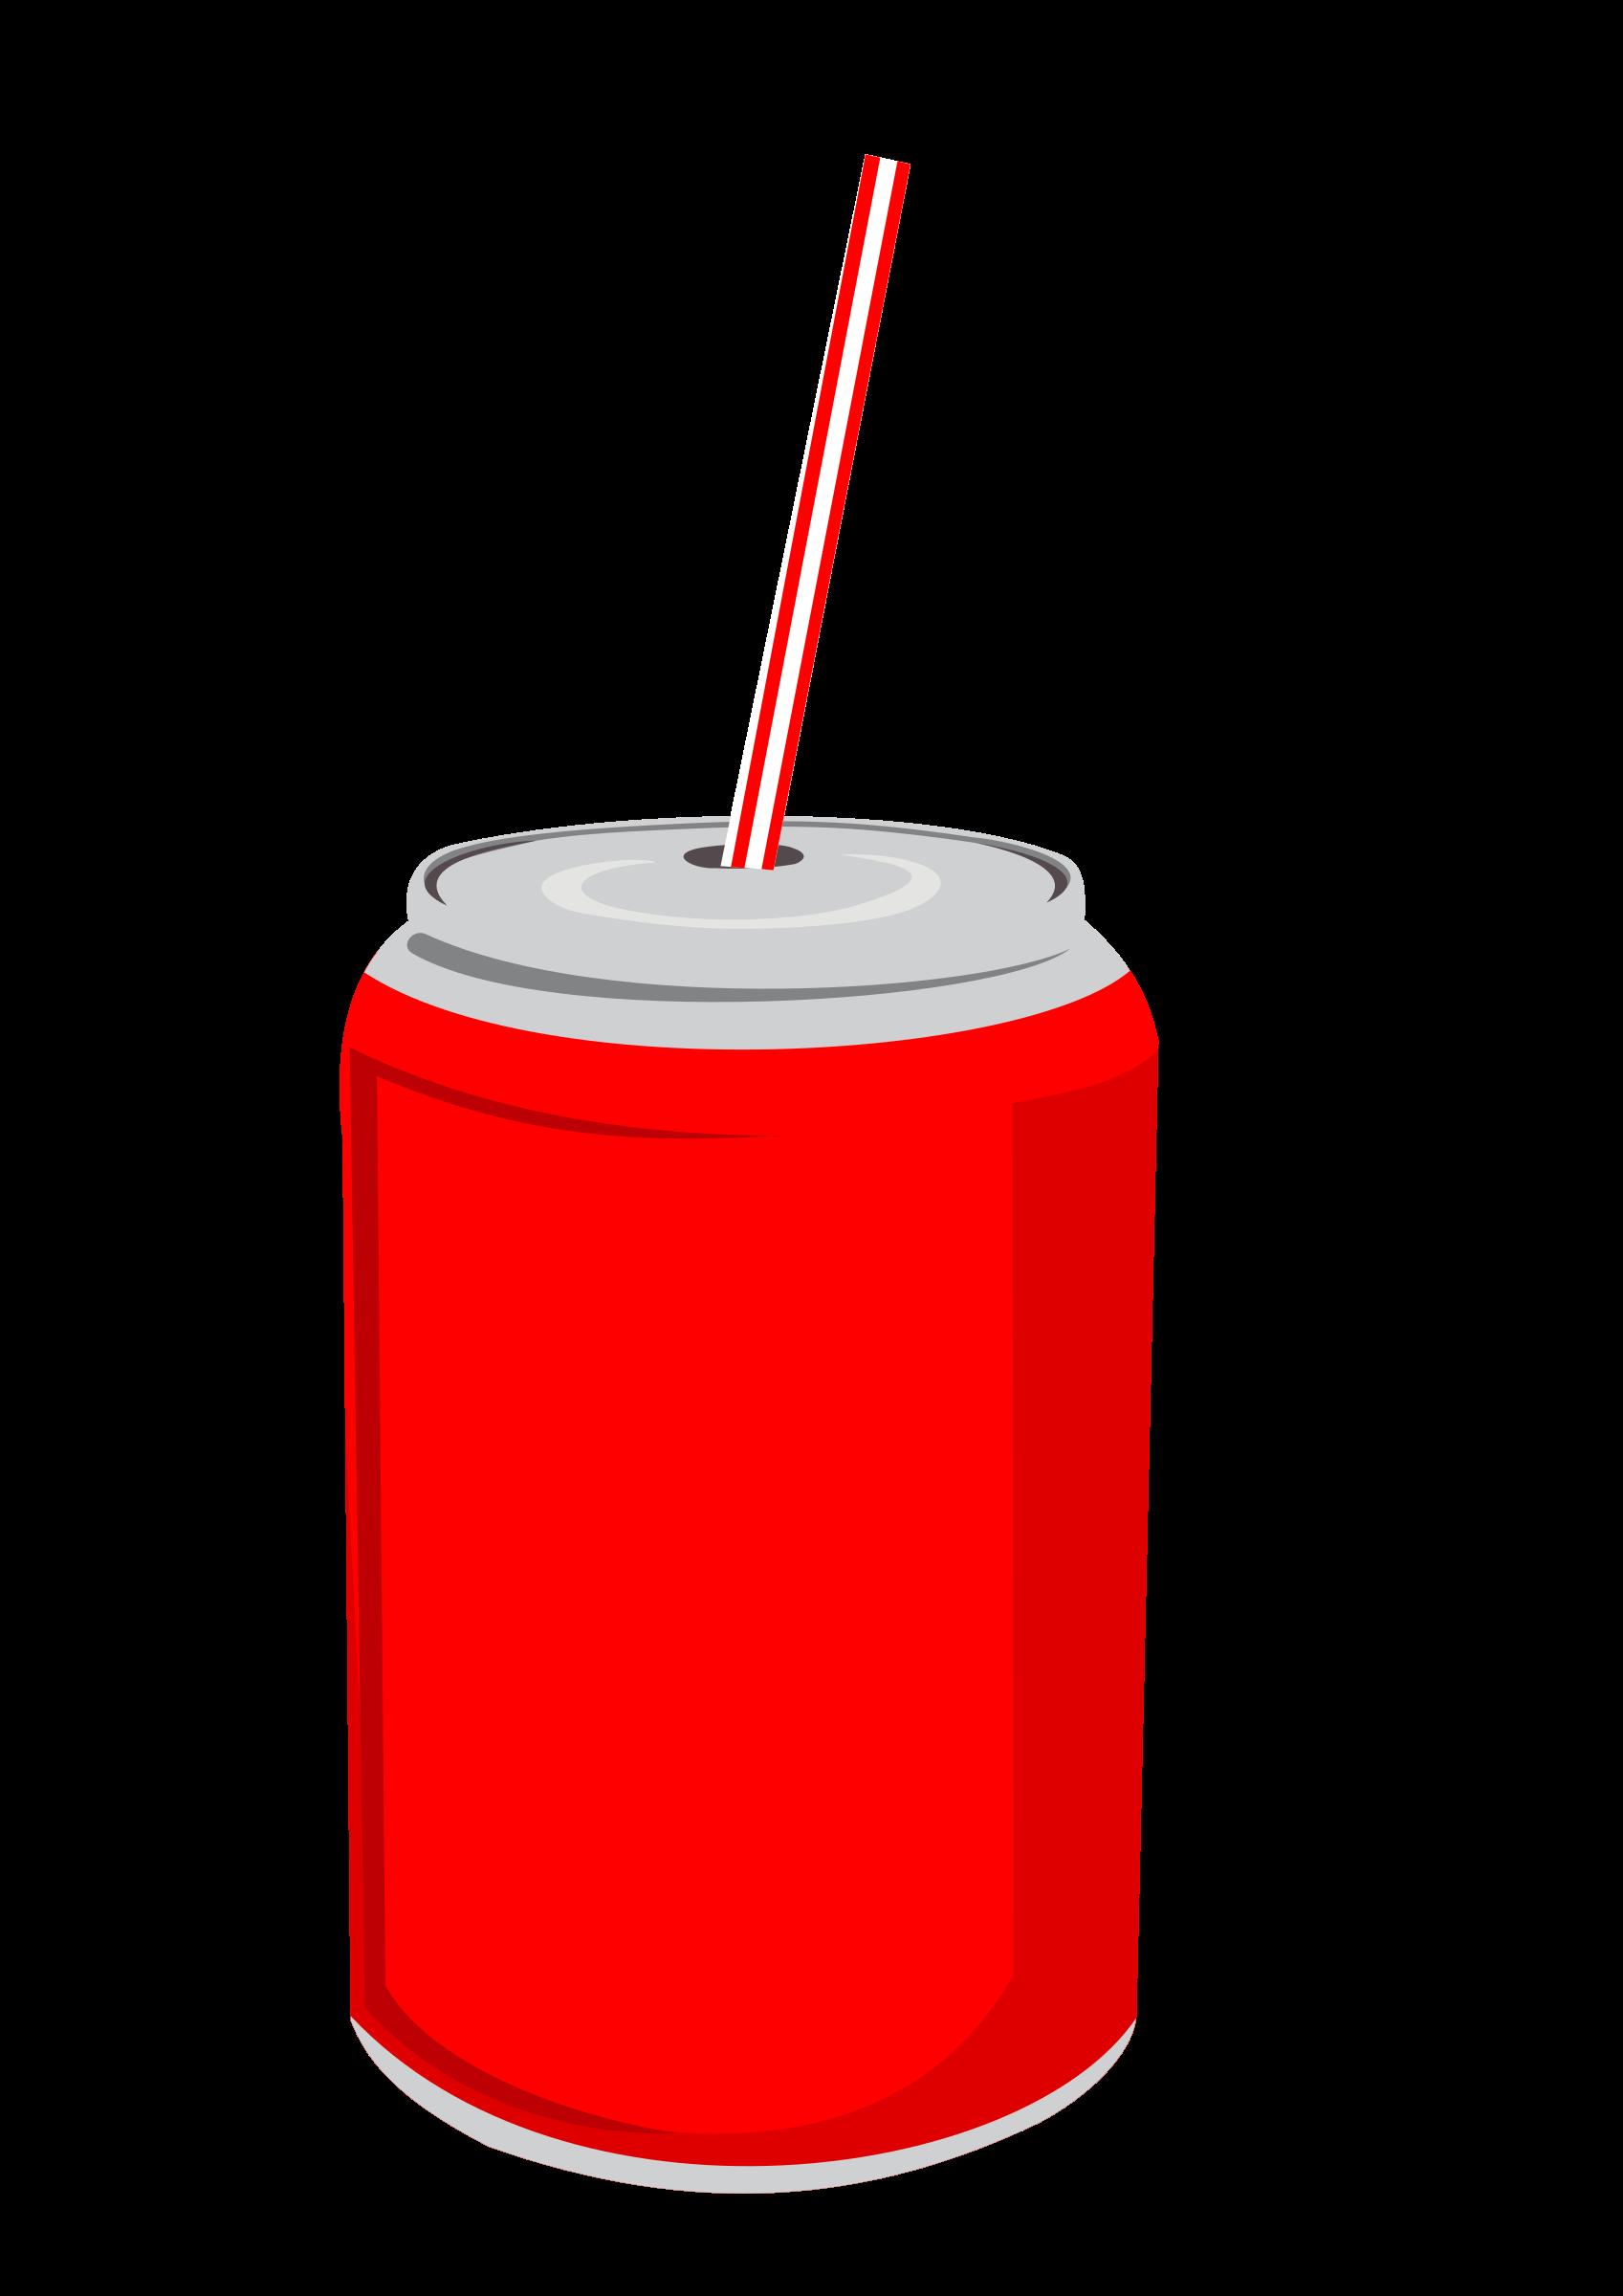 Refrigerante icons png free. Cinema clipart soda